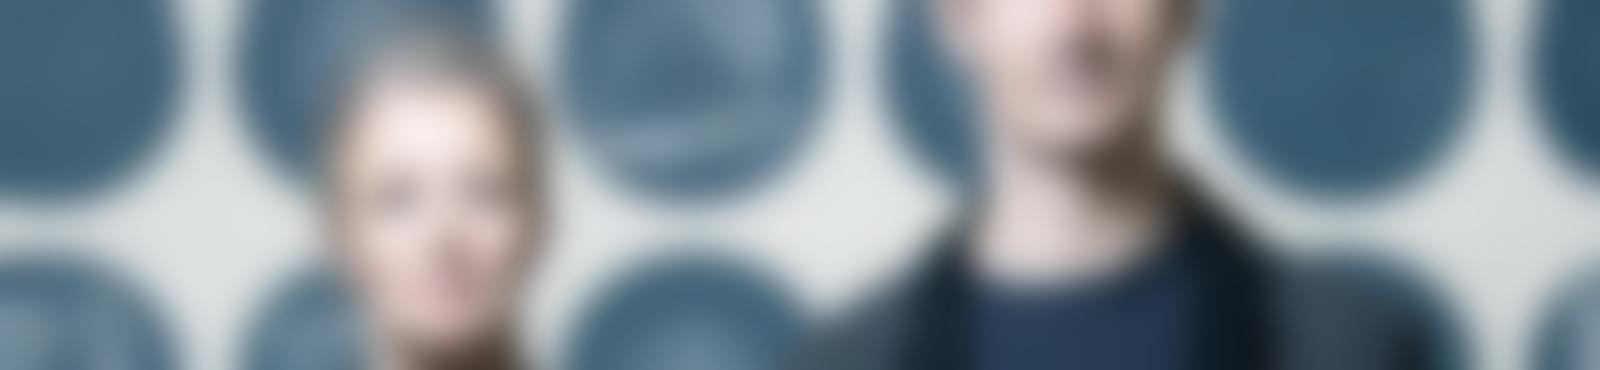 Blurred 4228c3c6 8592 453f 81e1 087d9205abdd